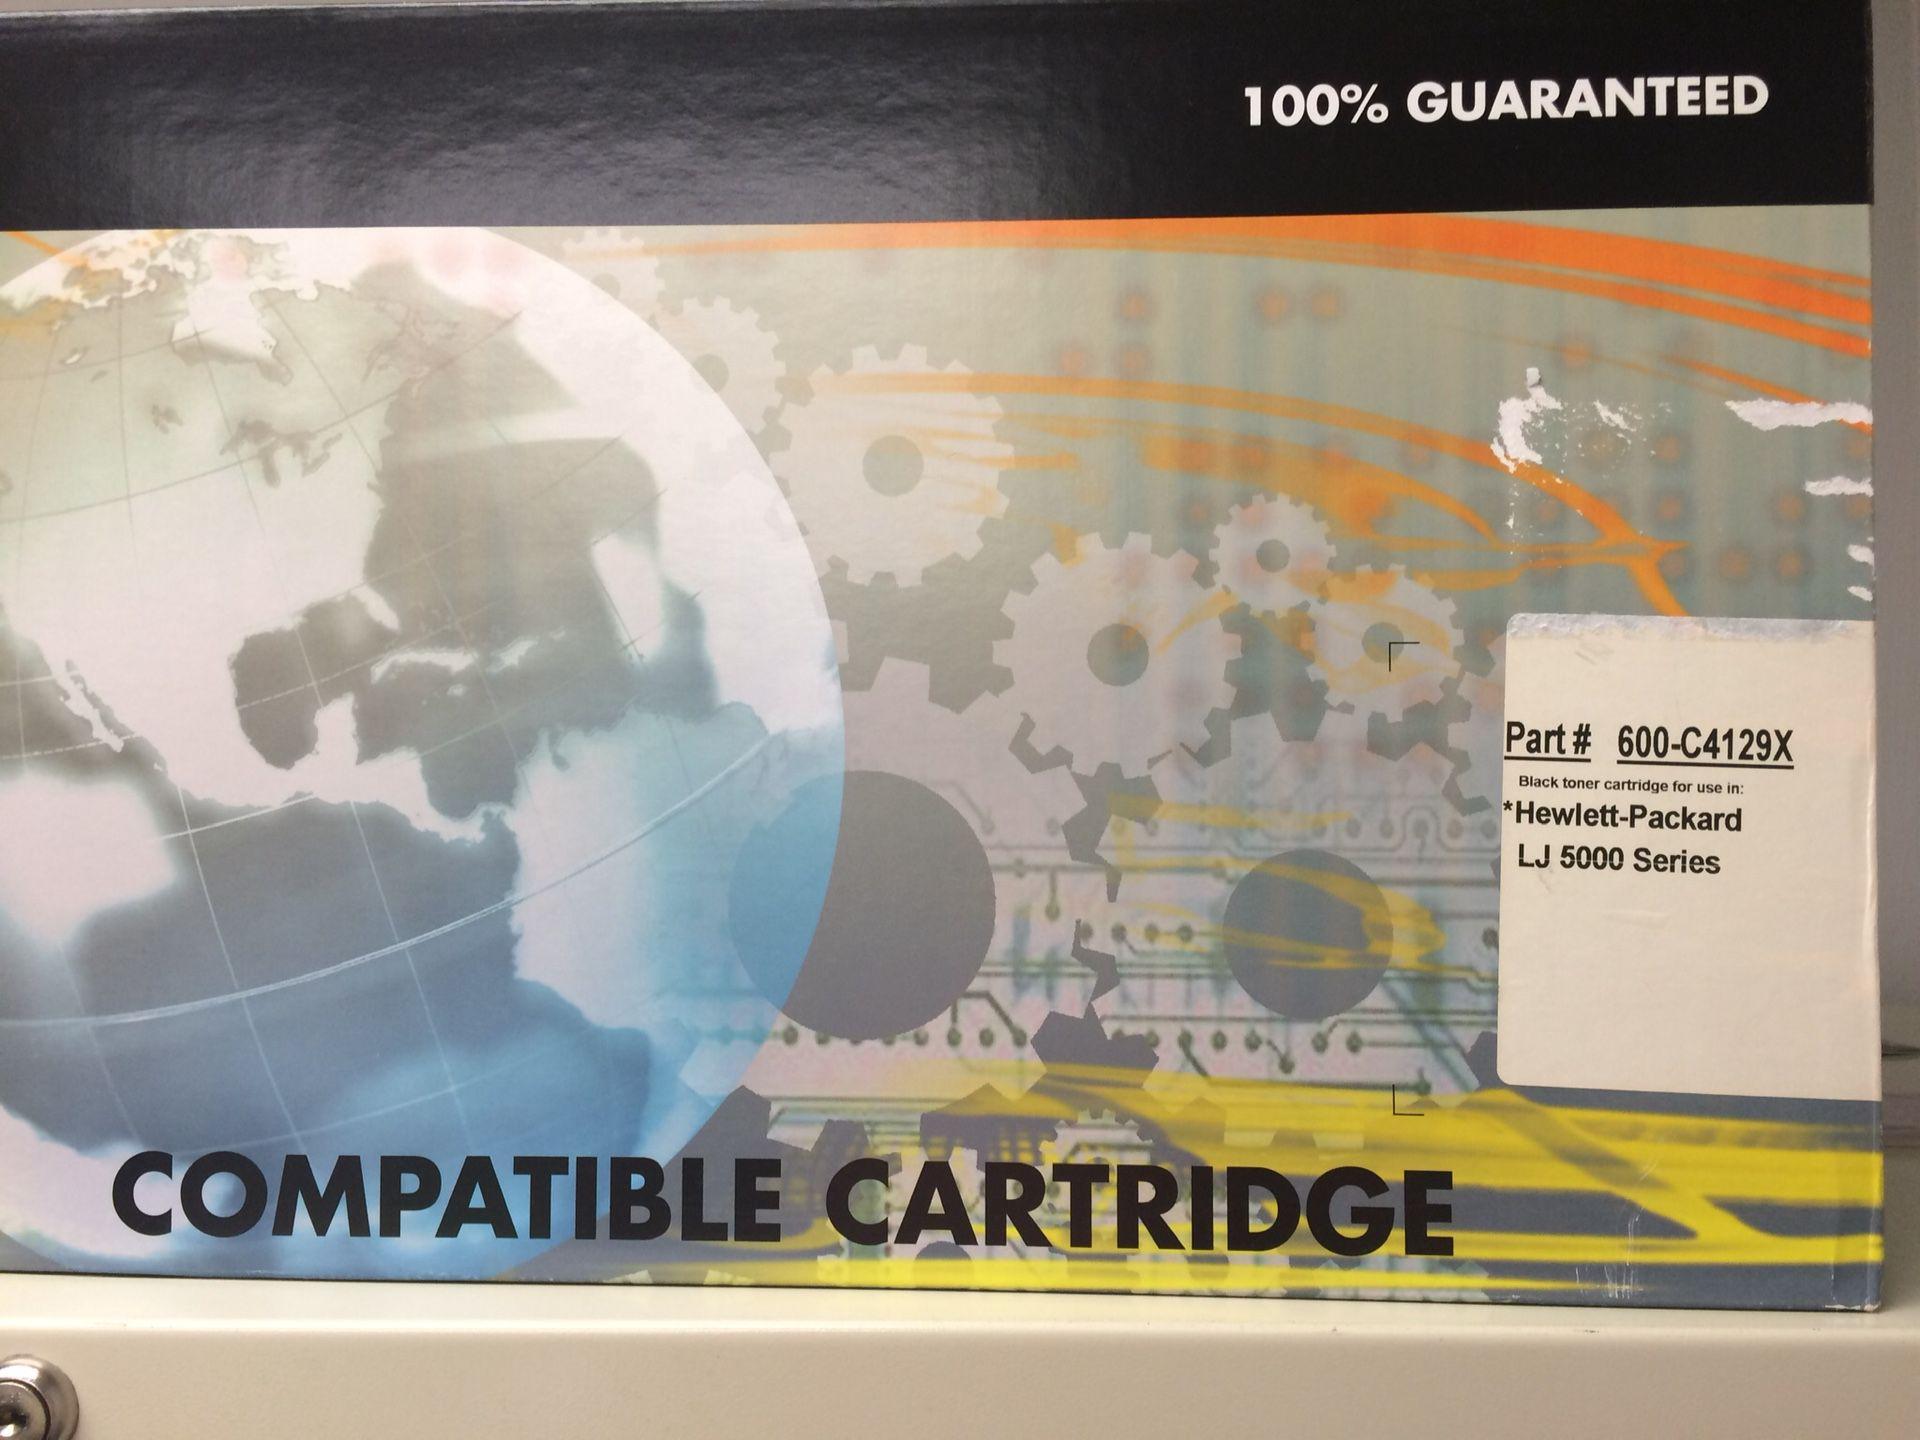 Toner cartridge for hewlett -packard LJ5000 series printer